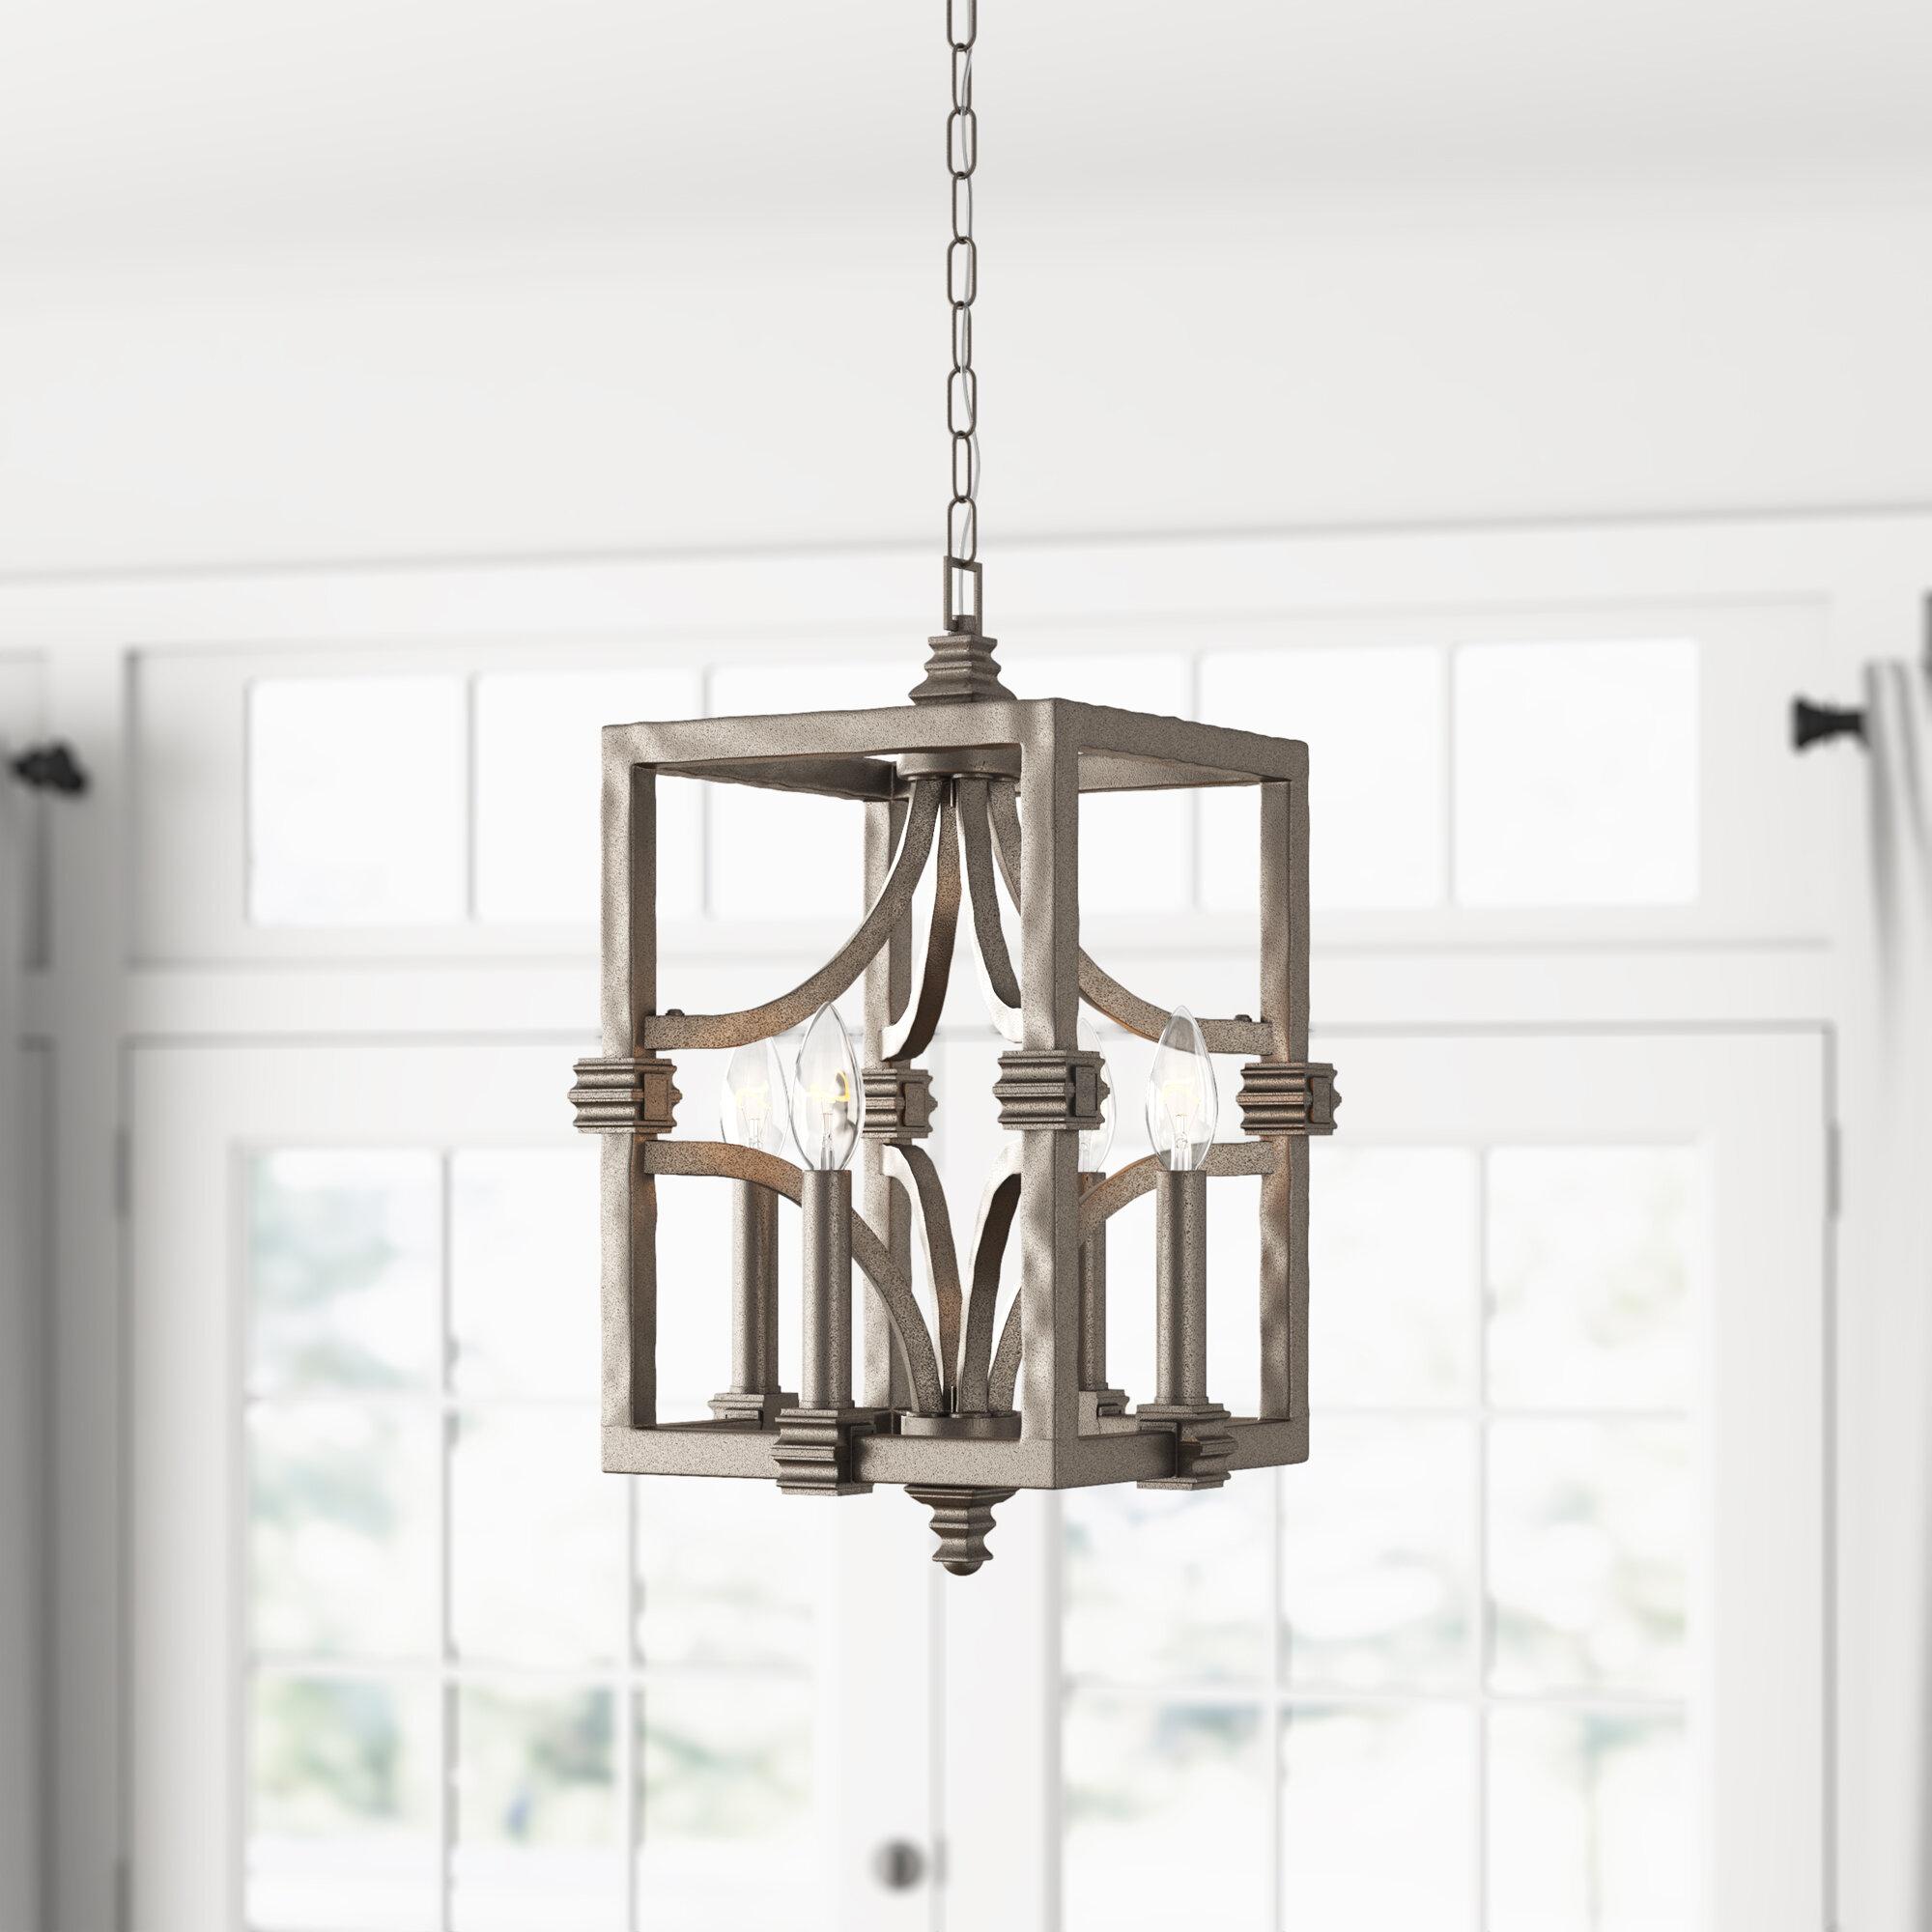 Freeburg 4-Light Lantern Square / Rectangle Pendant for Adcock 3-Light Single Globe Pendants (Image 21 of 30)